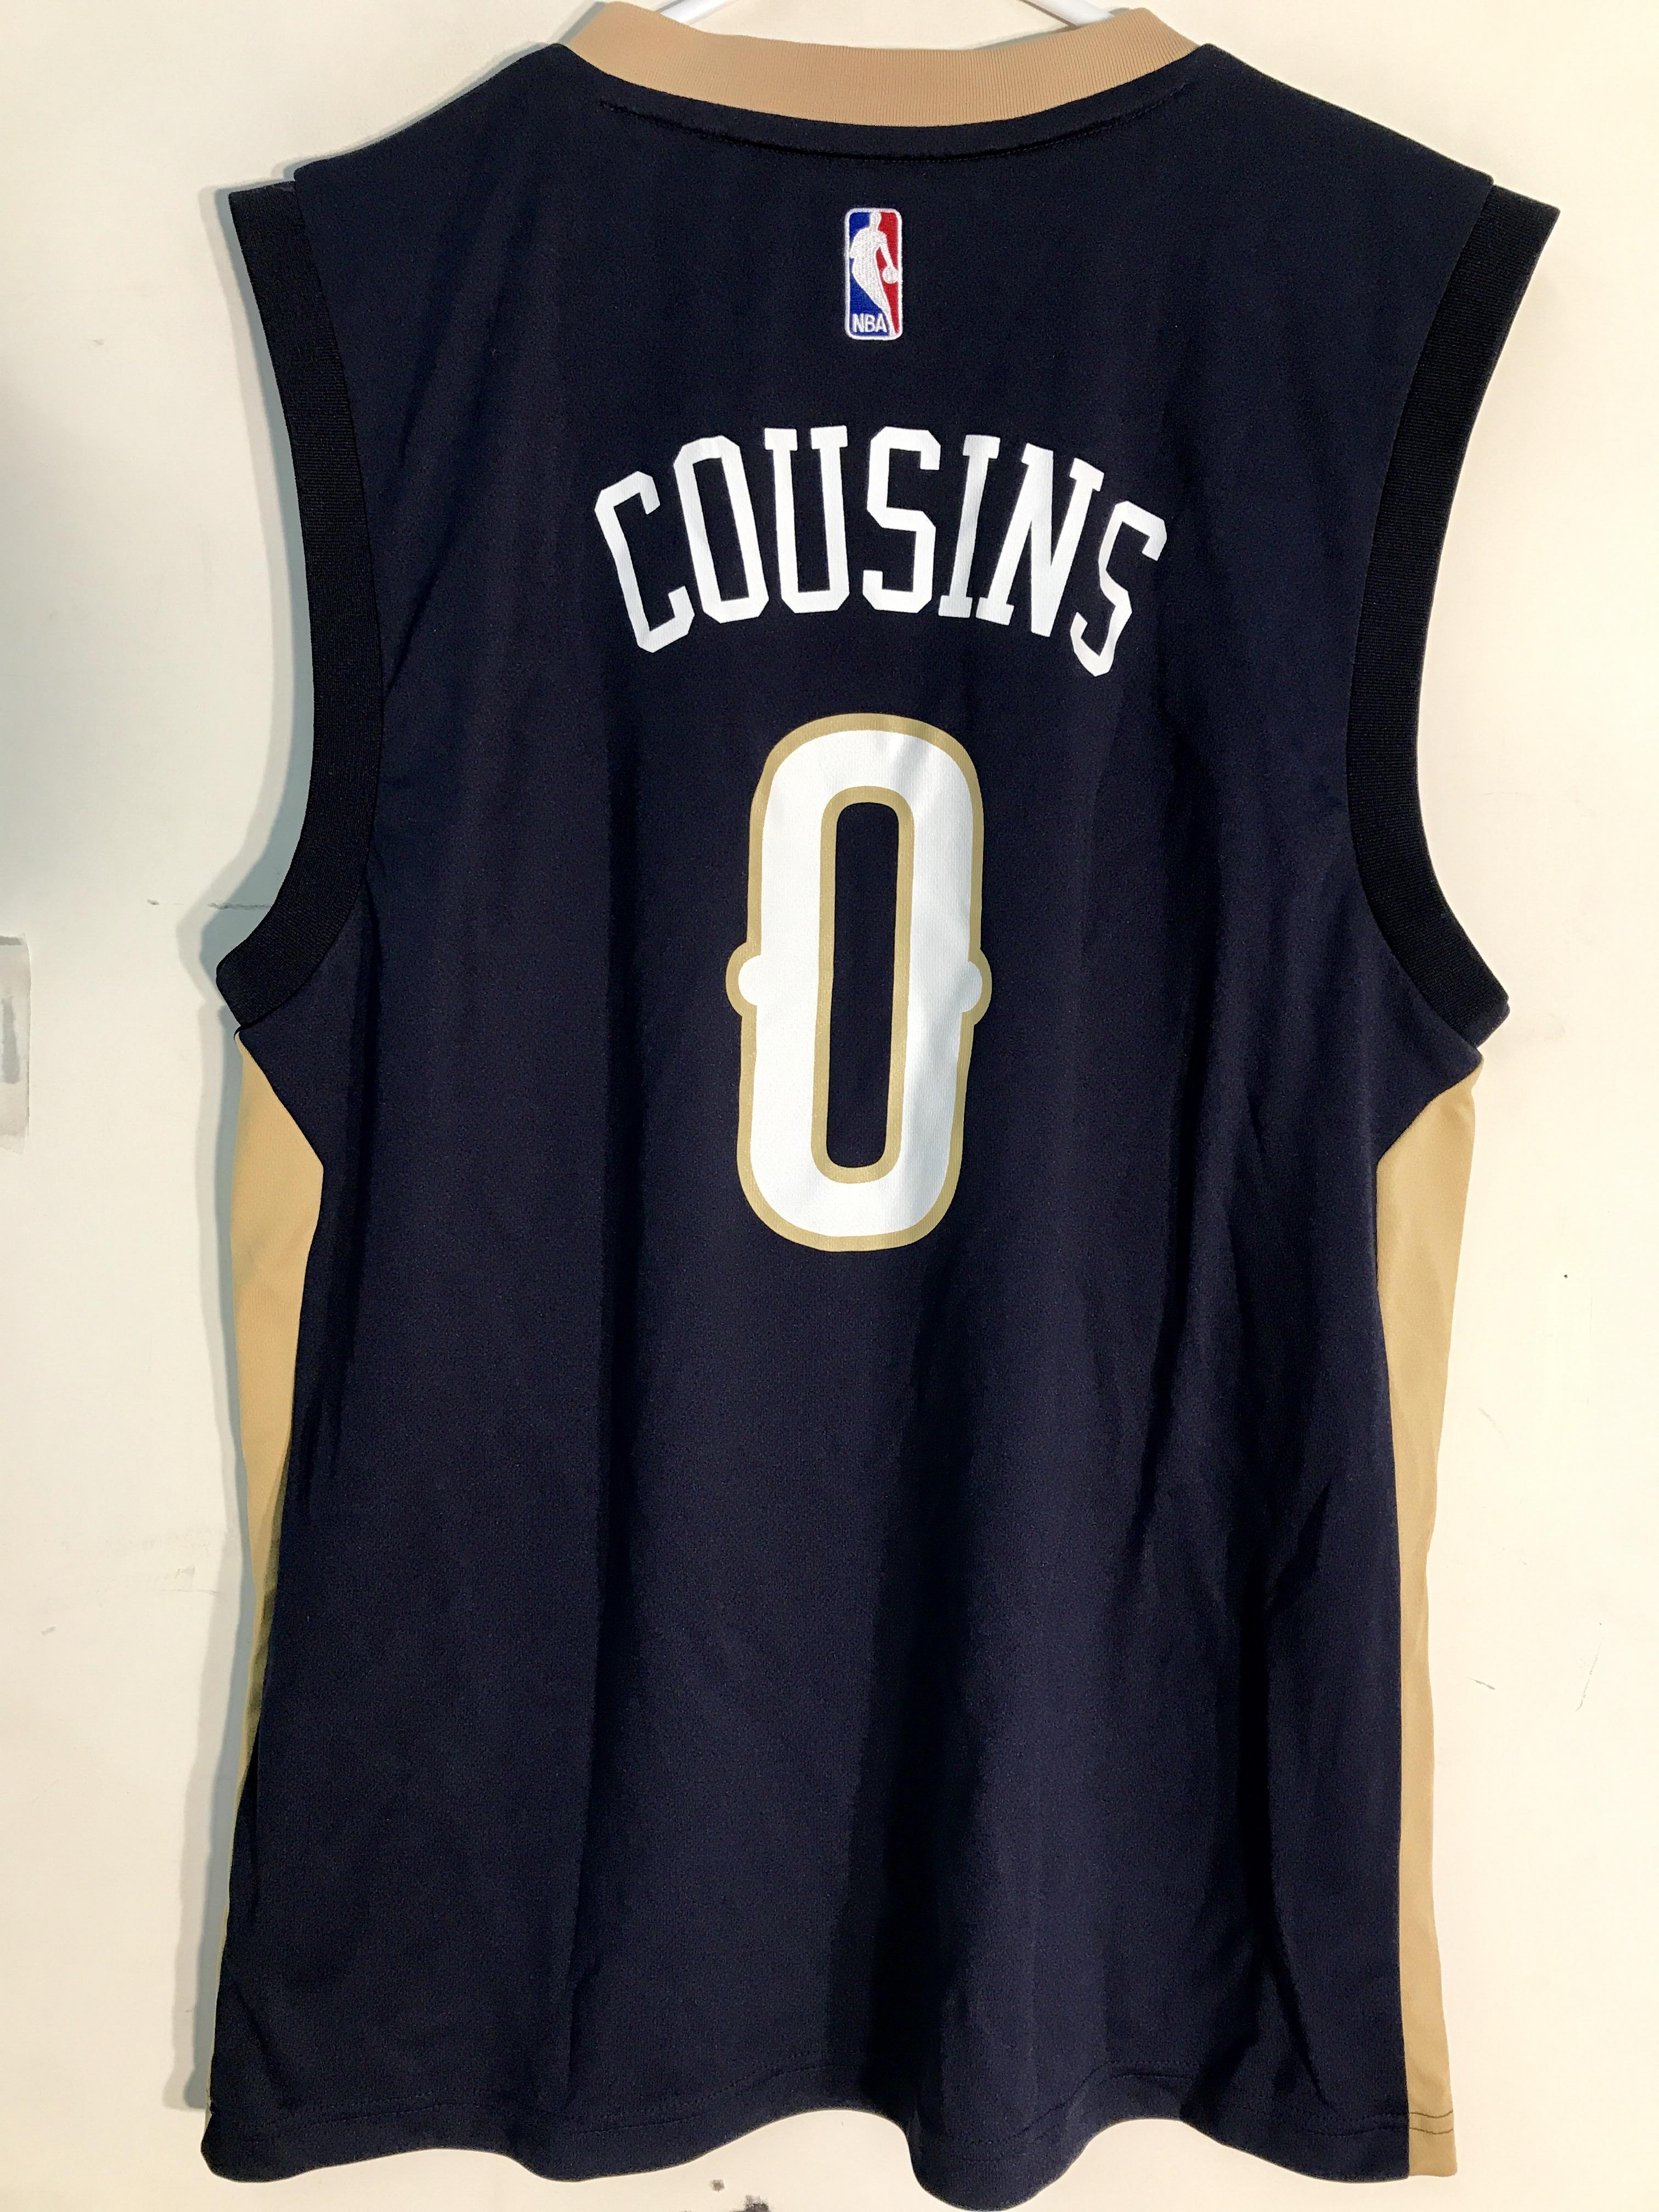 4db972f85a5 ... denmark details about adidas nba jersey new orleans pelicans demarcus  cousins navy sz m 7458e 57478